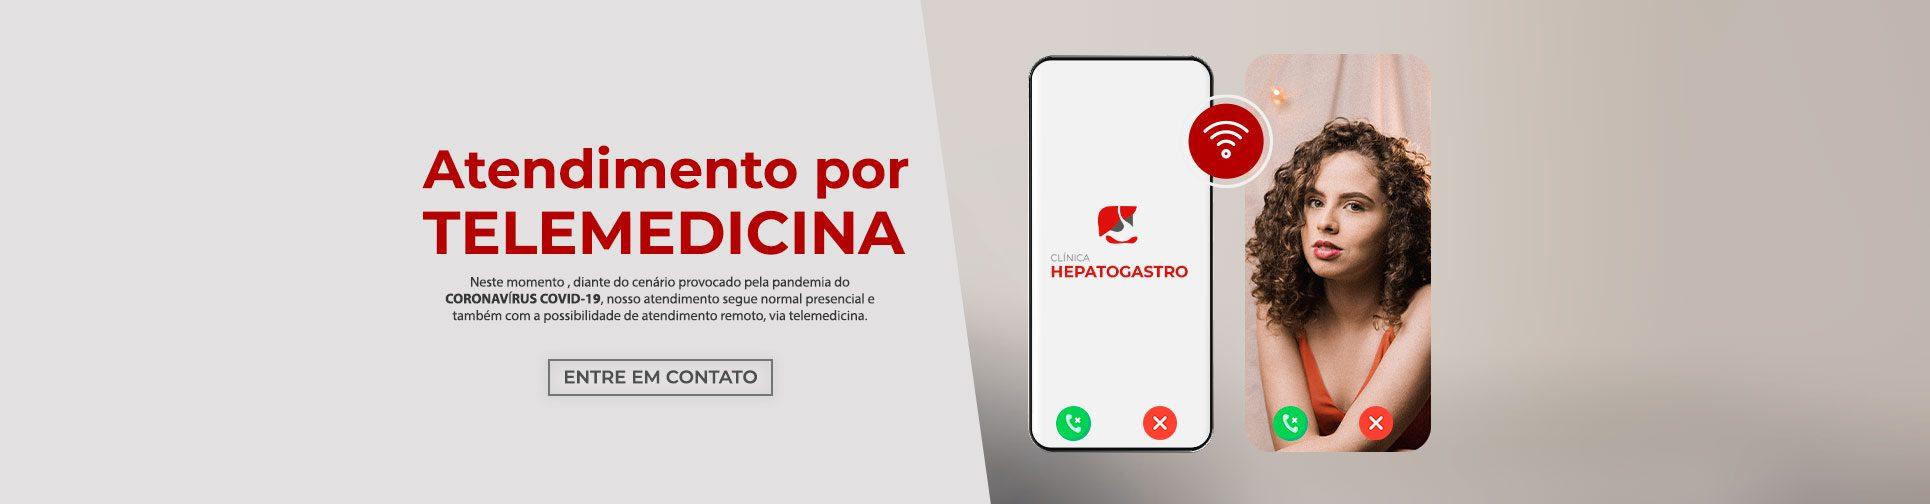 Banner Telemedicina | Clínica Hepatogastro